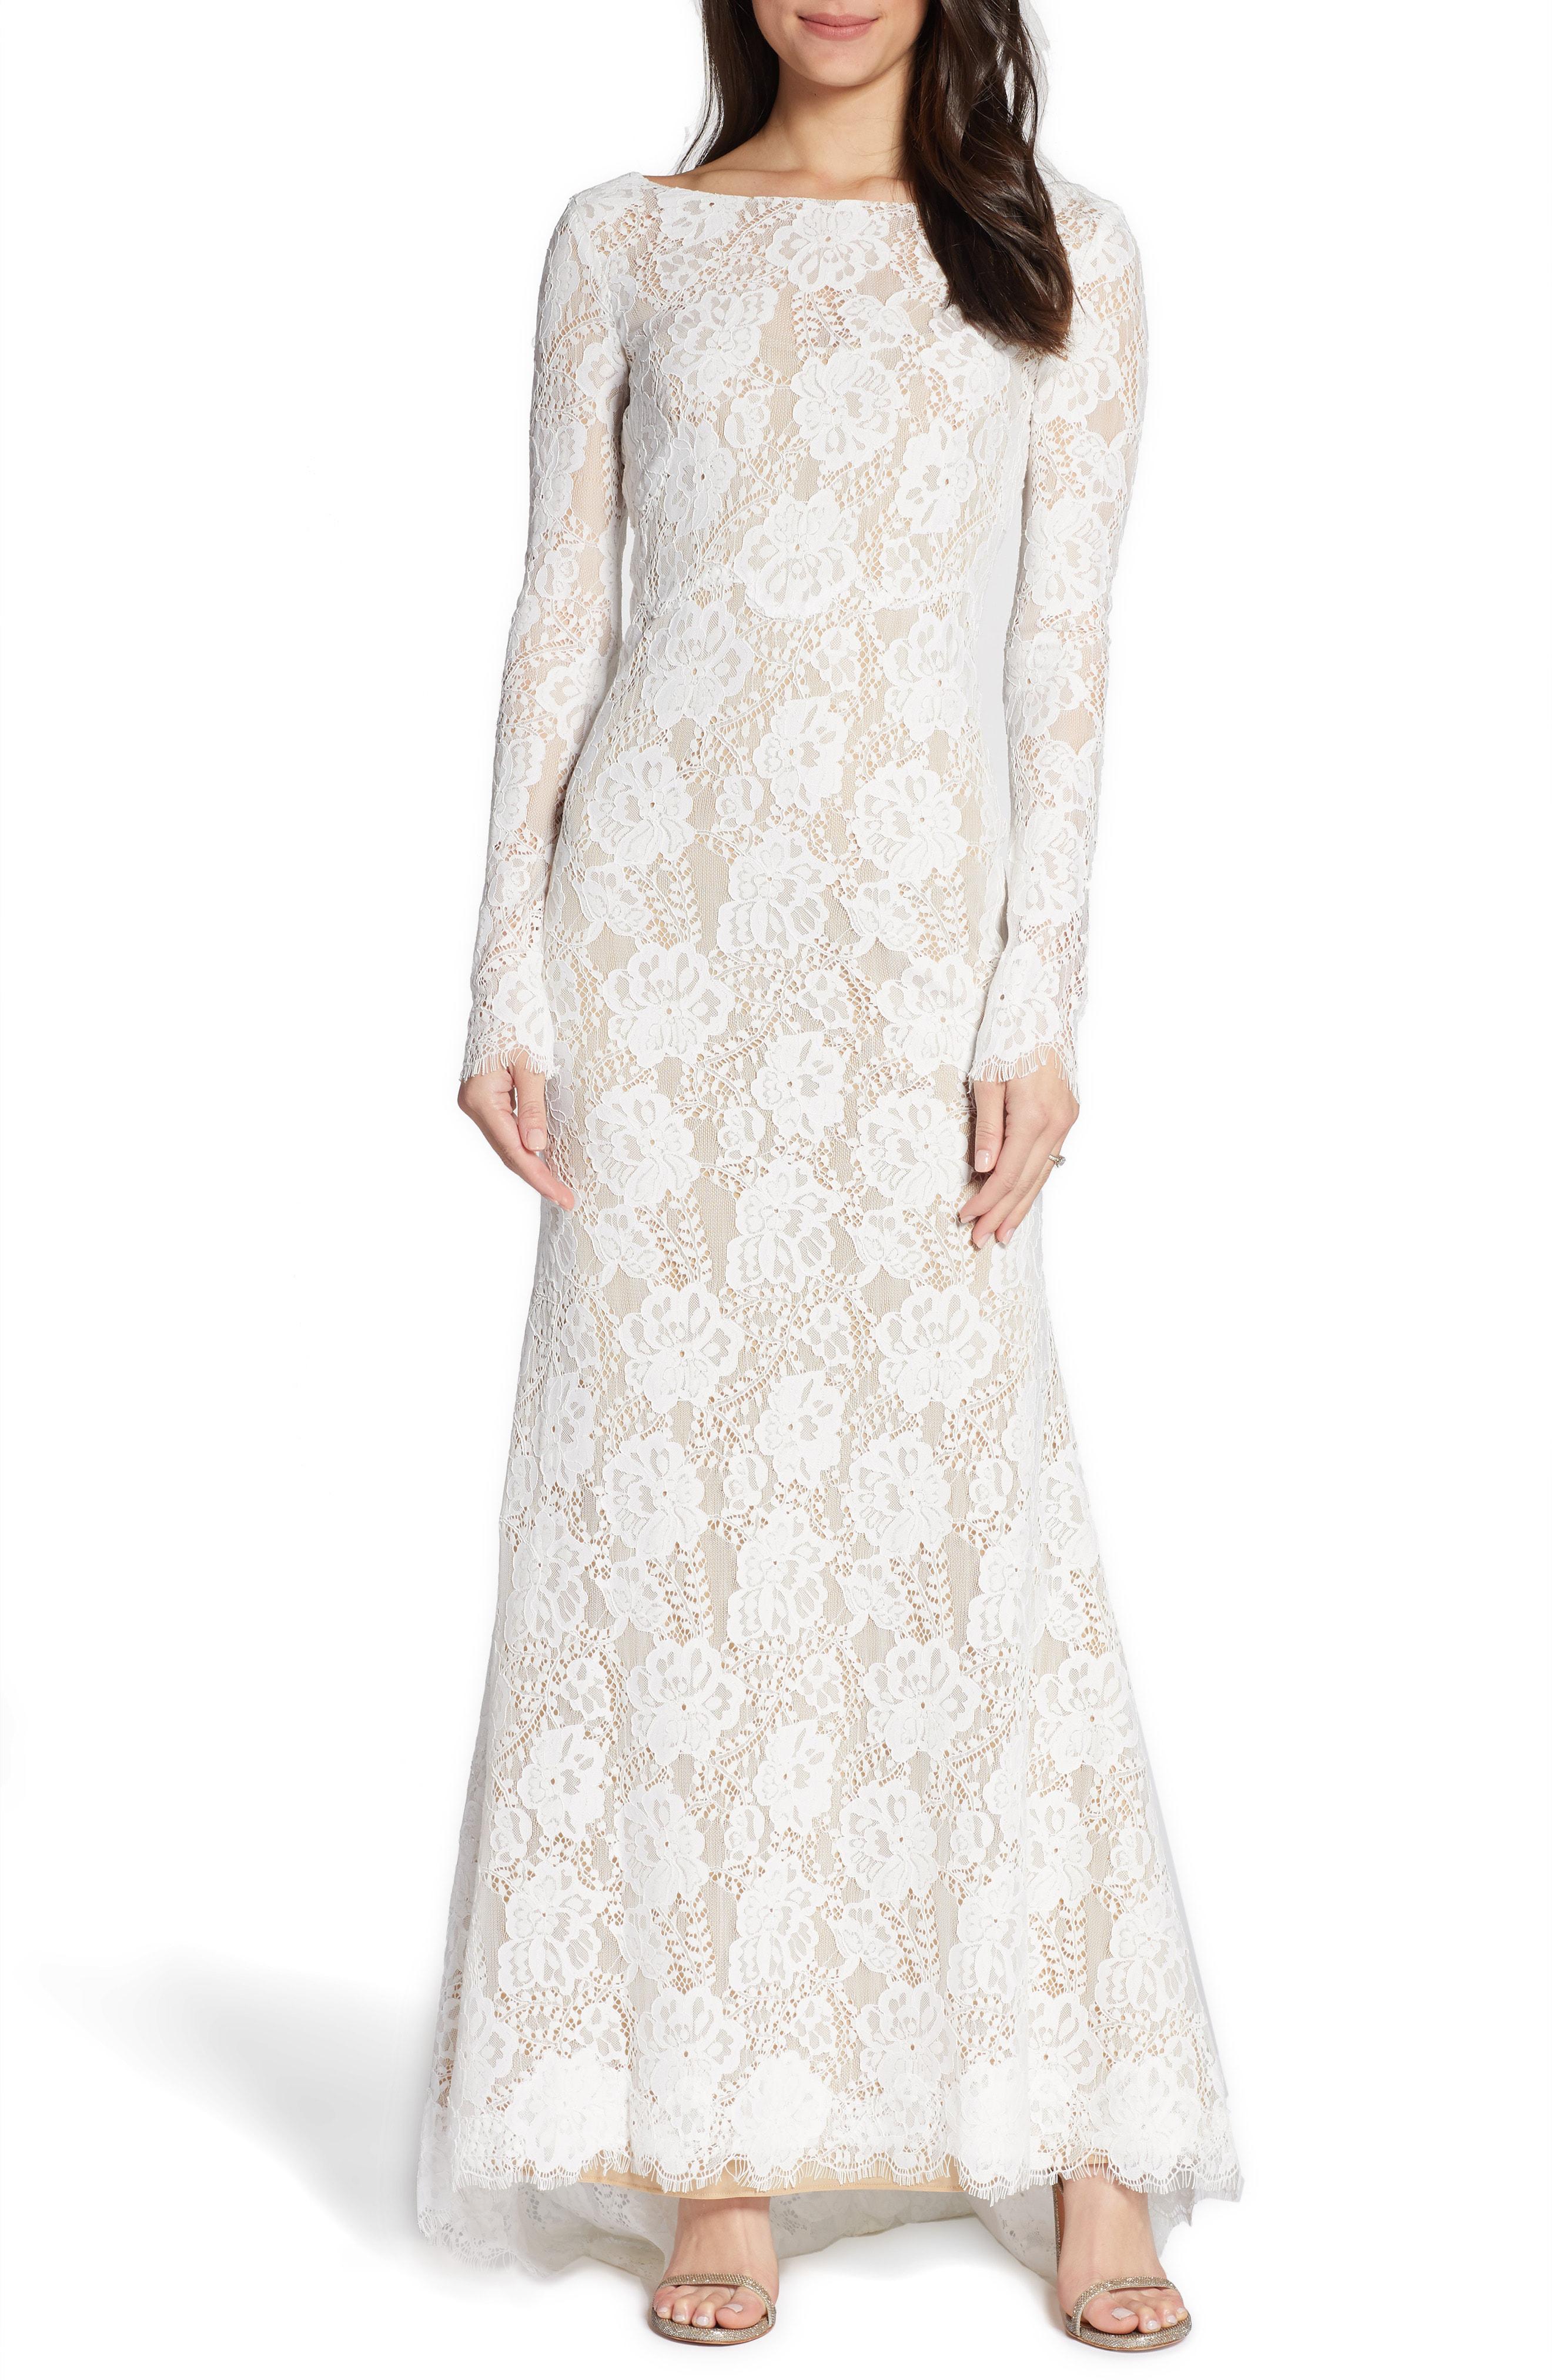 Watters Eyelash Lace Long Sleeve Wedding Dress In Ivory Modesens,October Wedding Guest Autumn Dresses 2020